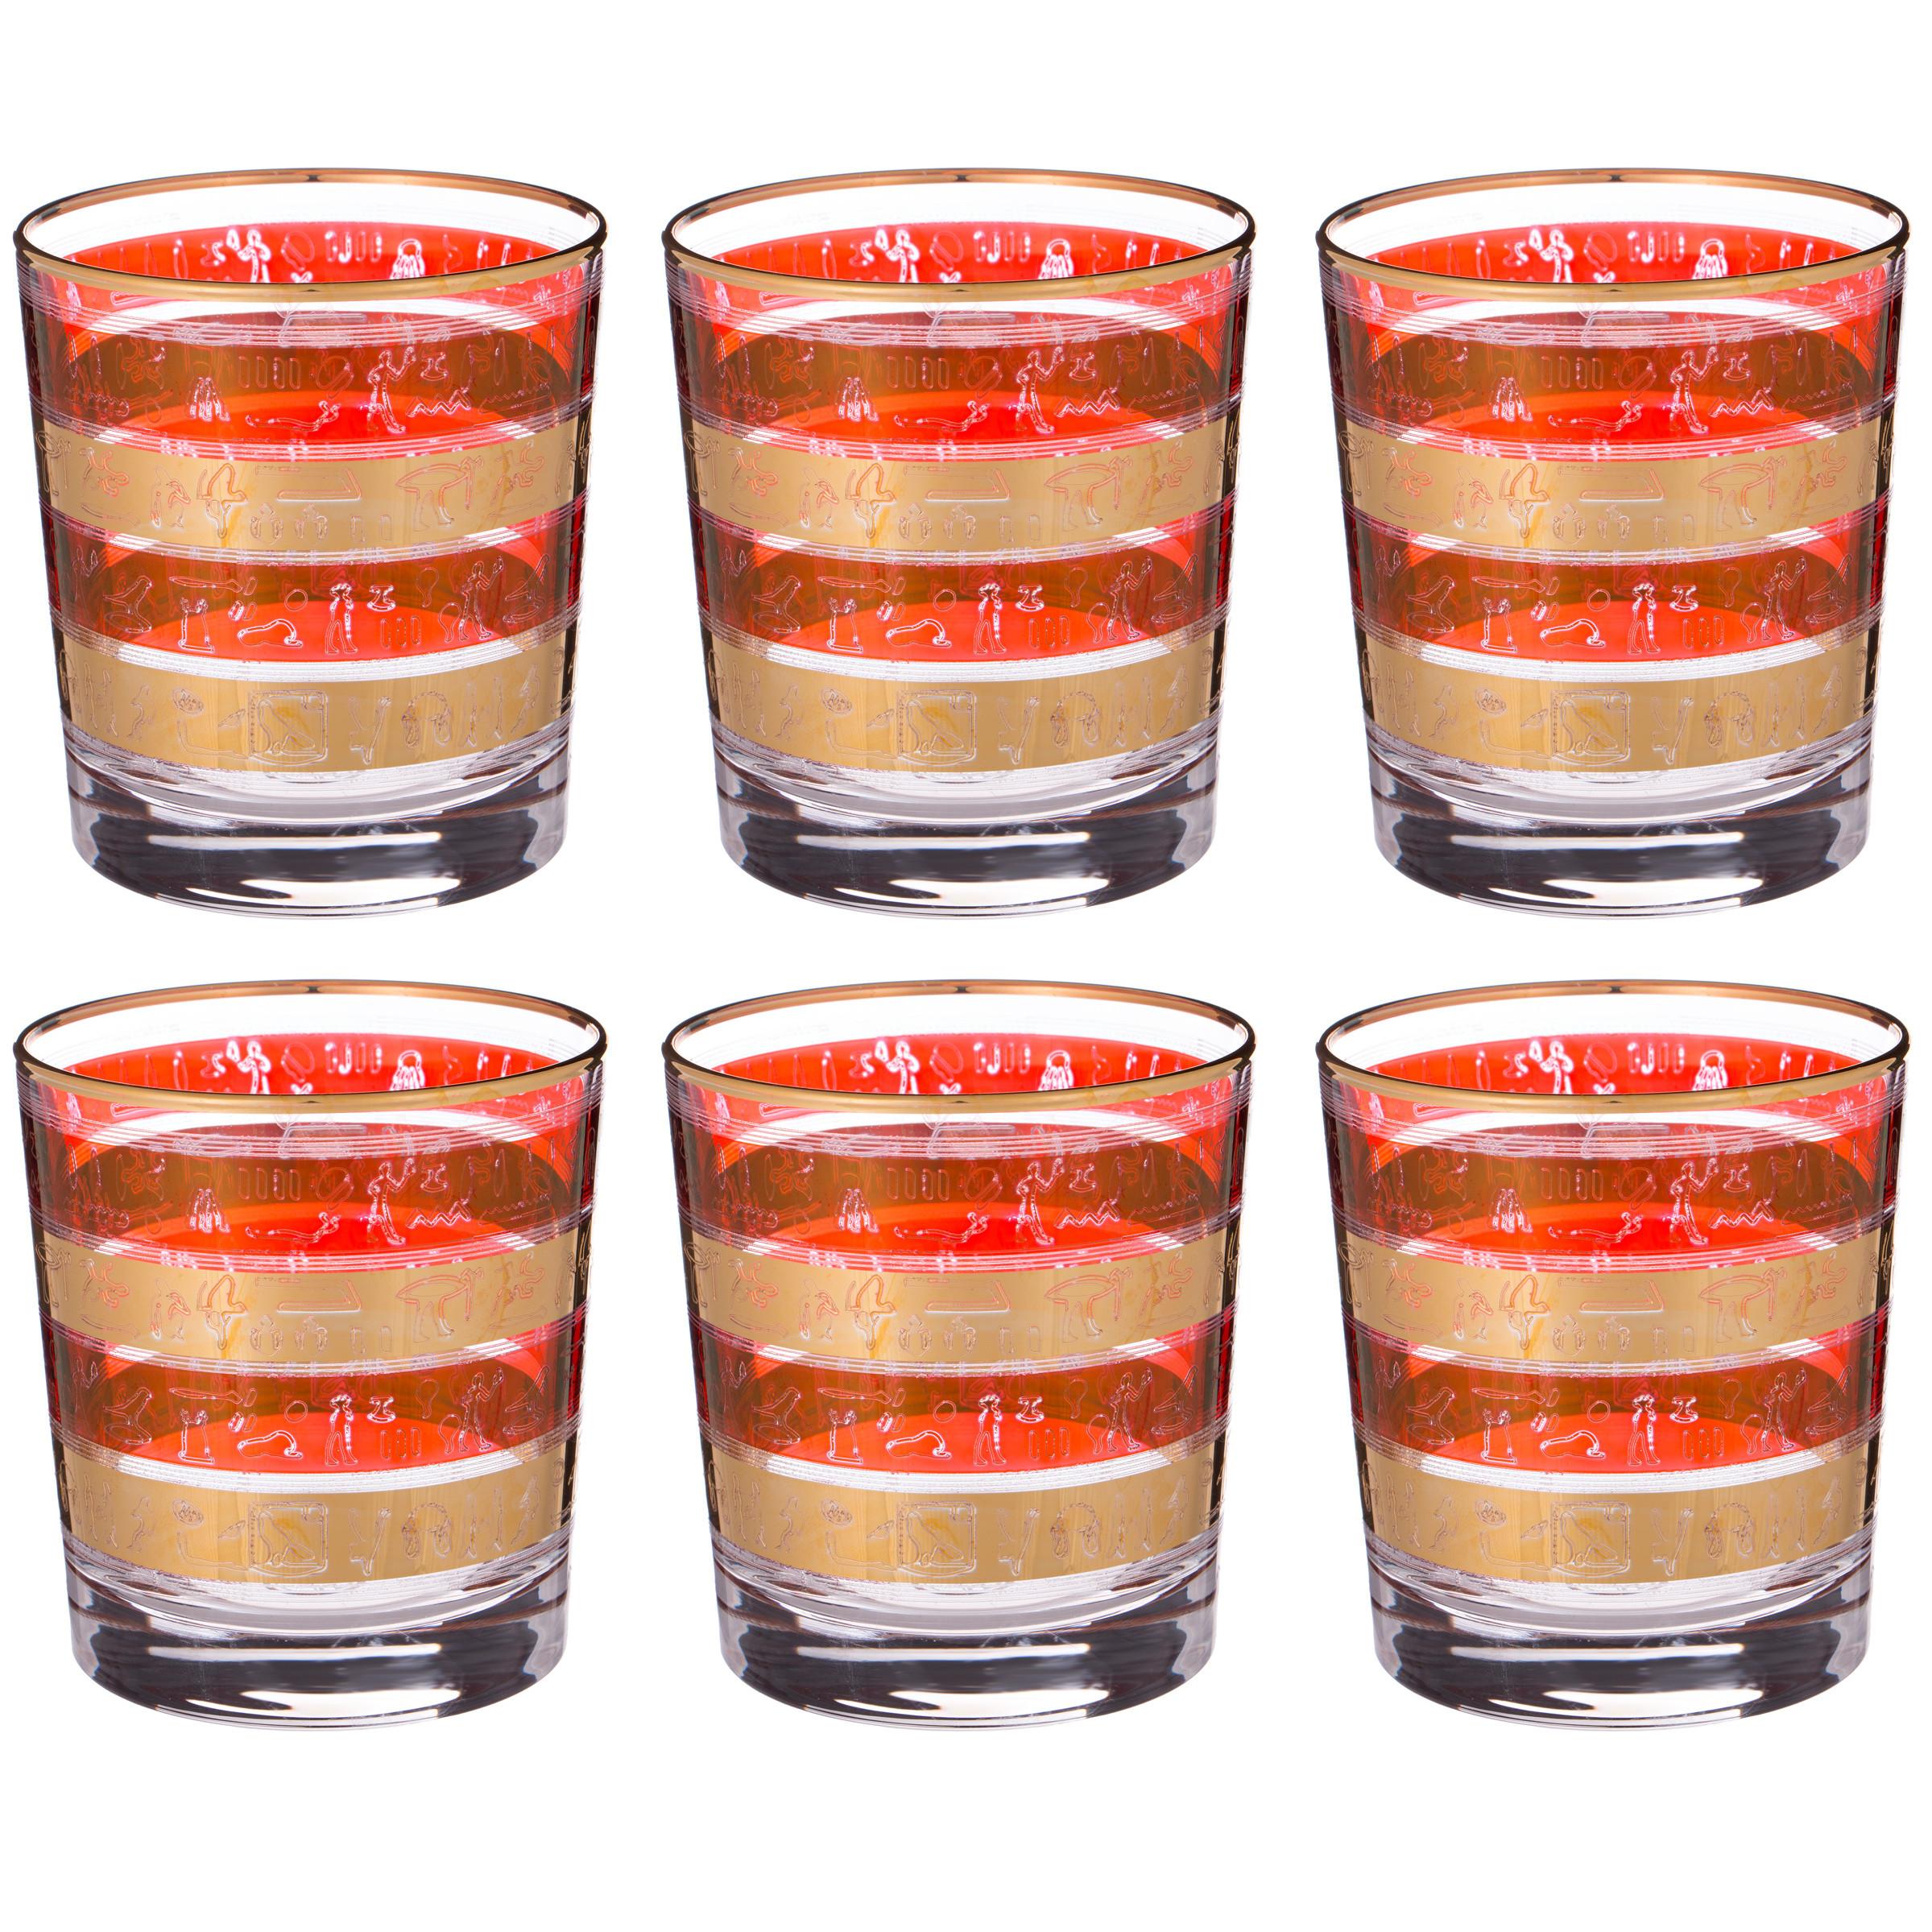 {} Same Набор стаканов Vonnie (300 мл - 6 шт)